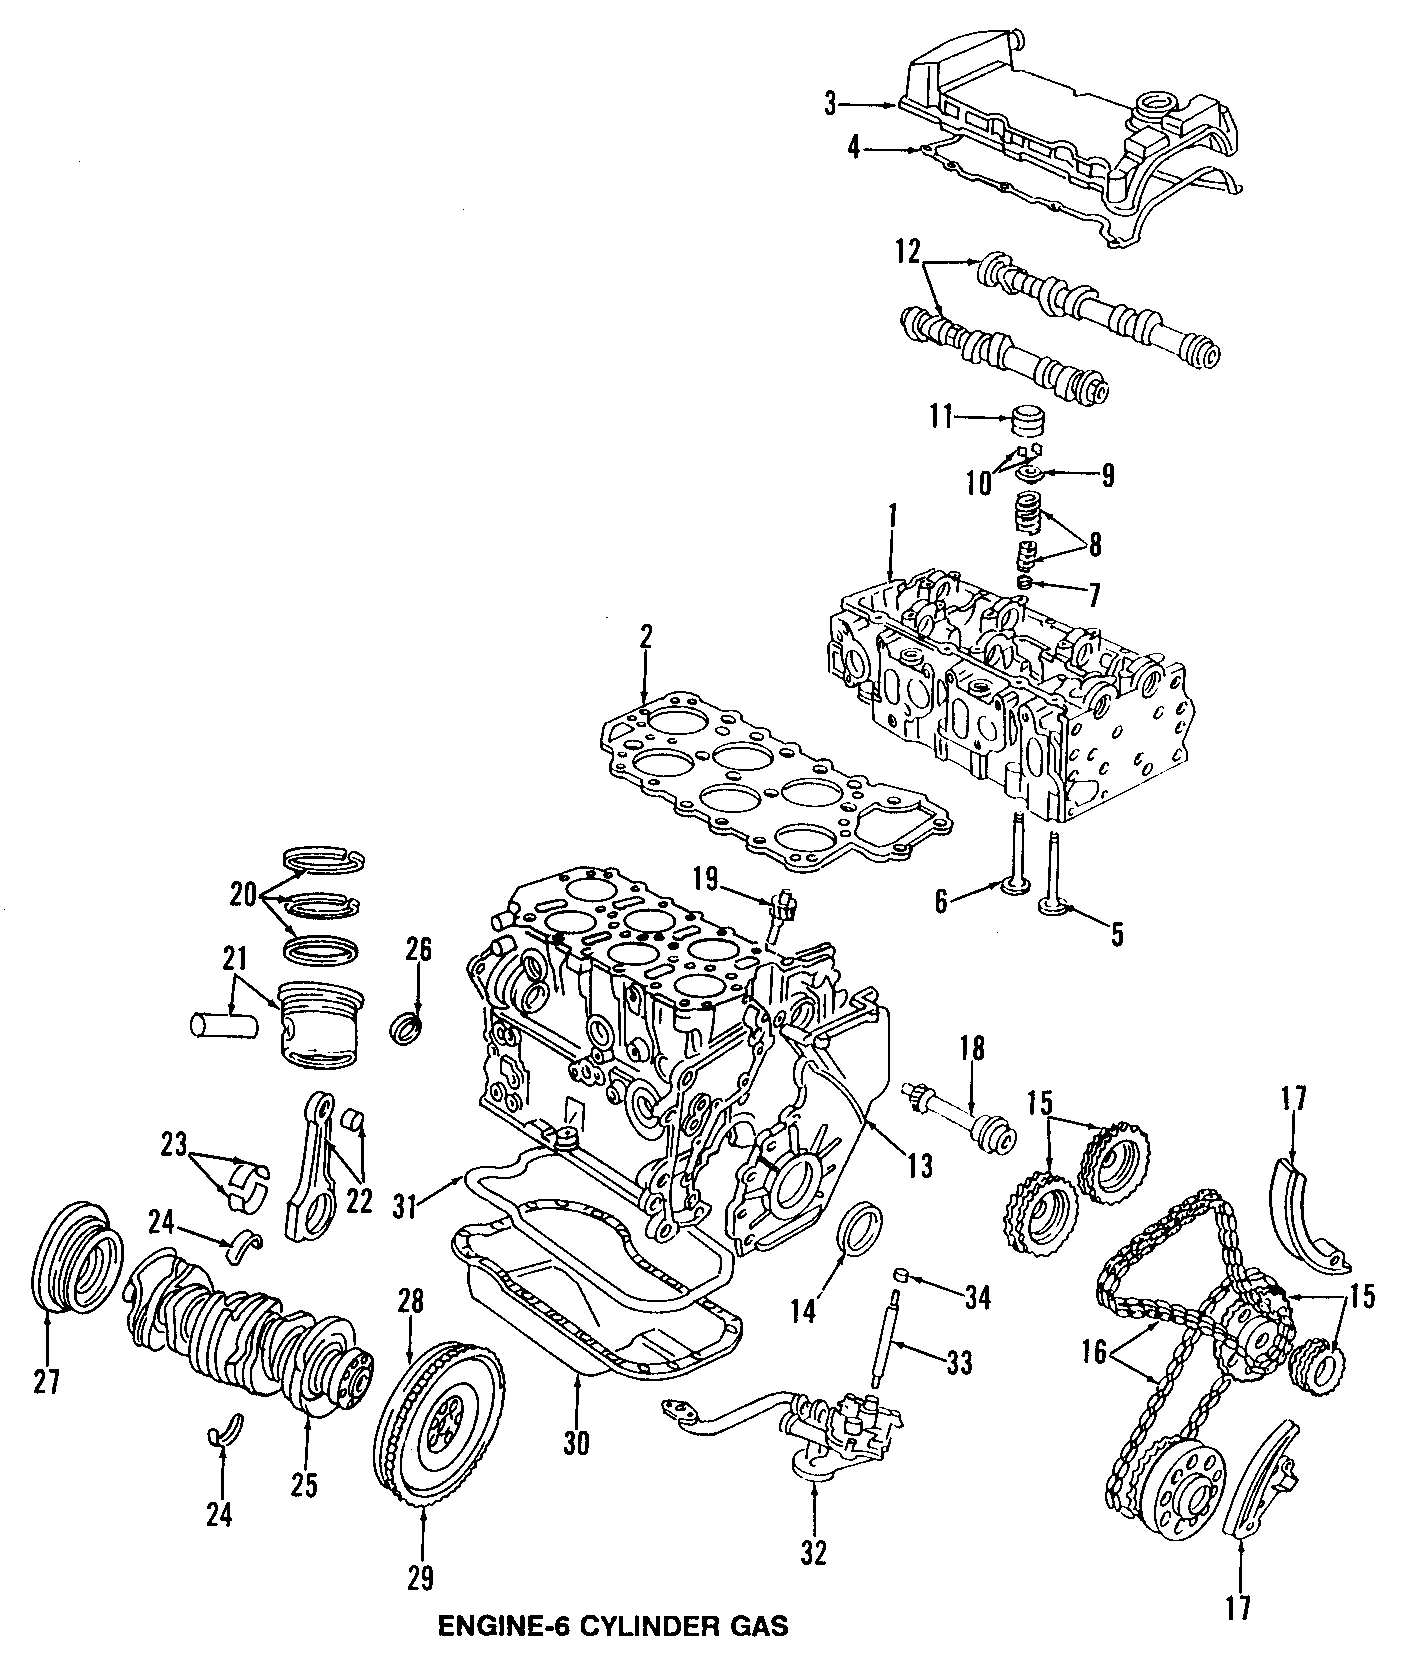 Volkswagen Passat Wagon Engine Piston Ring